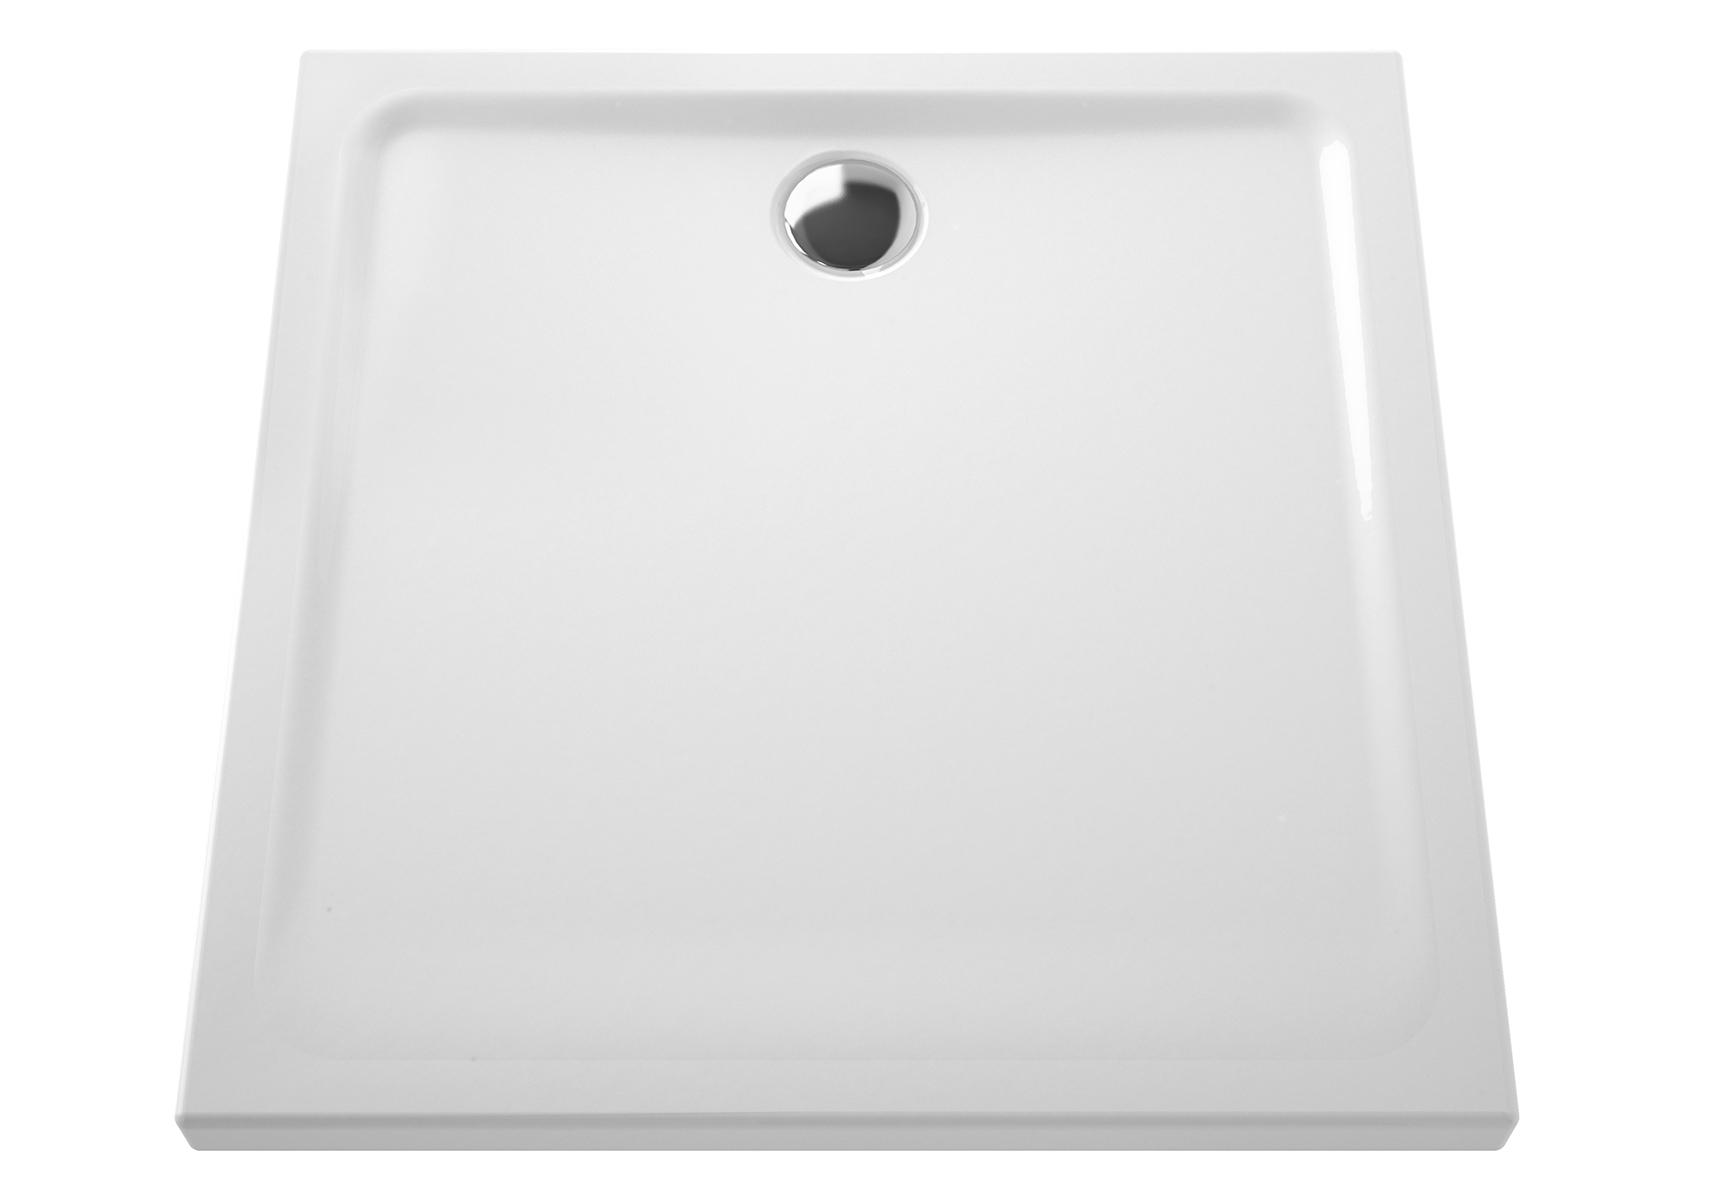 Arkitekt receveur à encastrer ou à poser extra plat, 90  x  90 cm